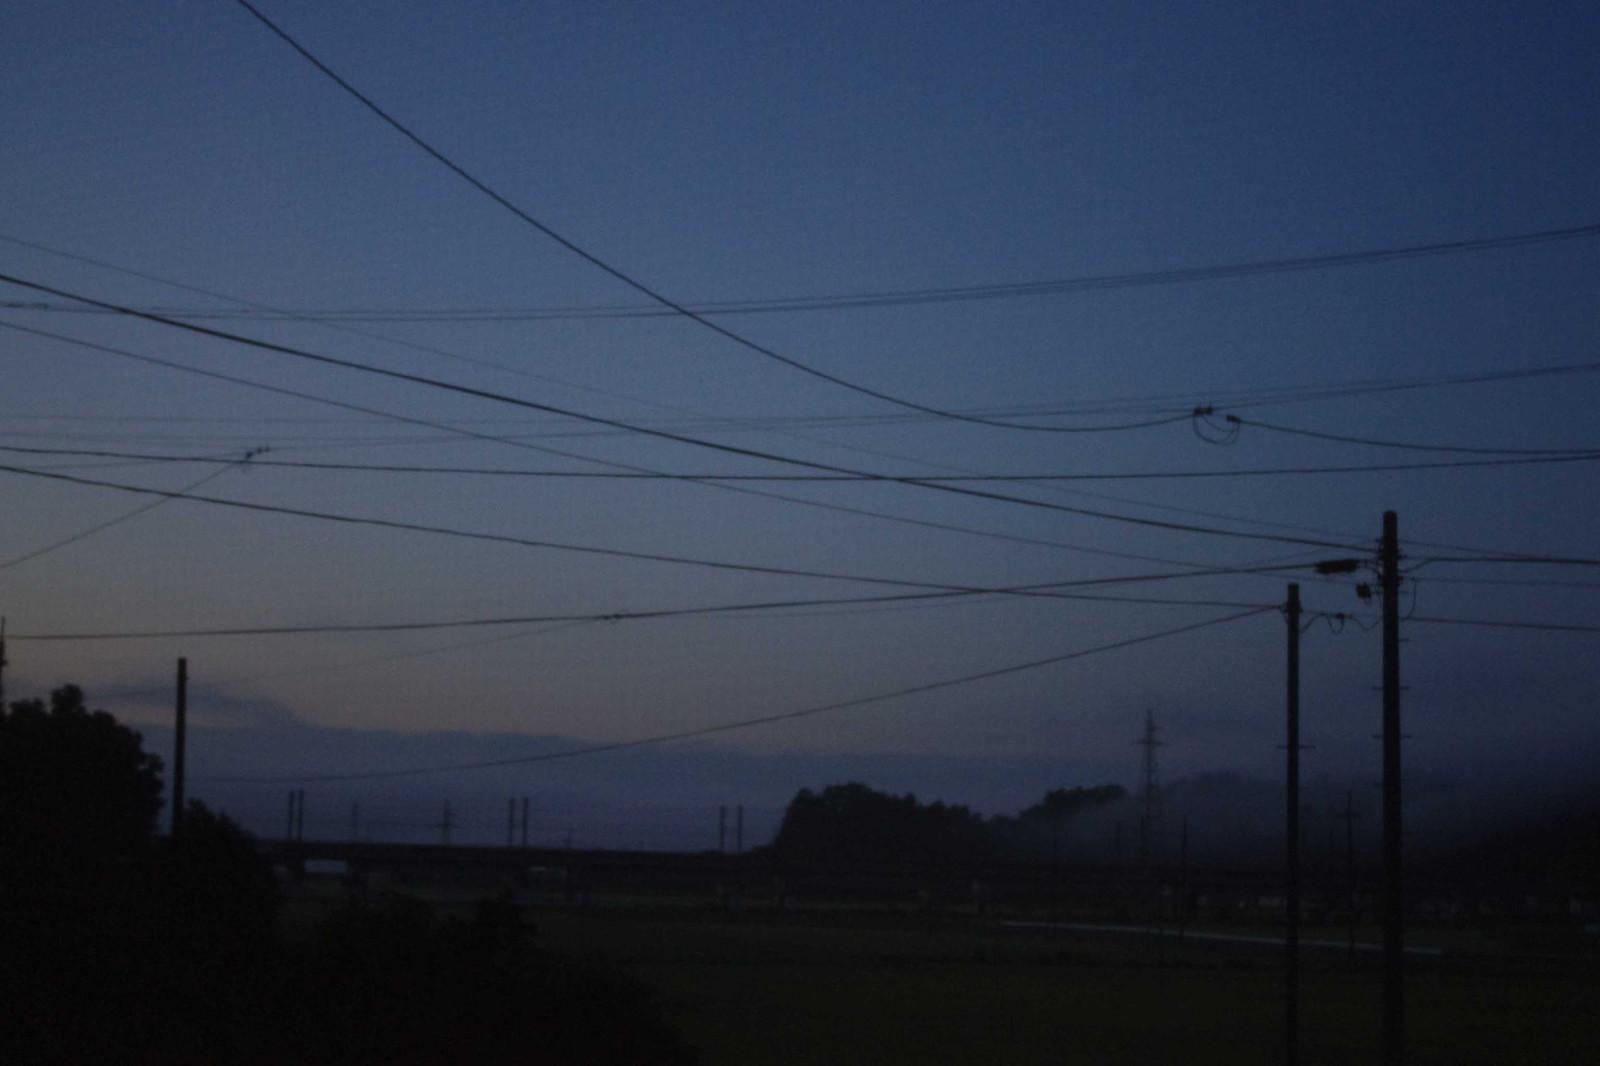 2012_09_07_8651_edited1